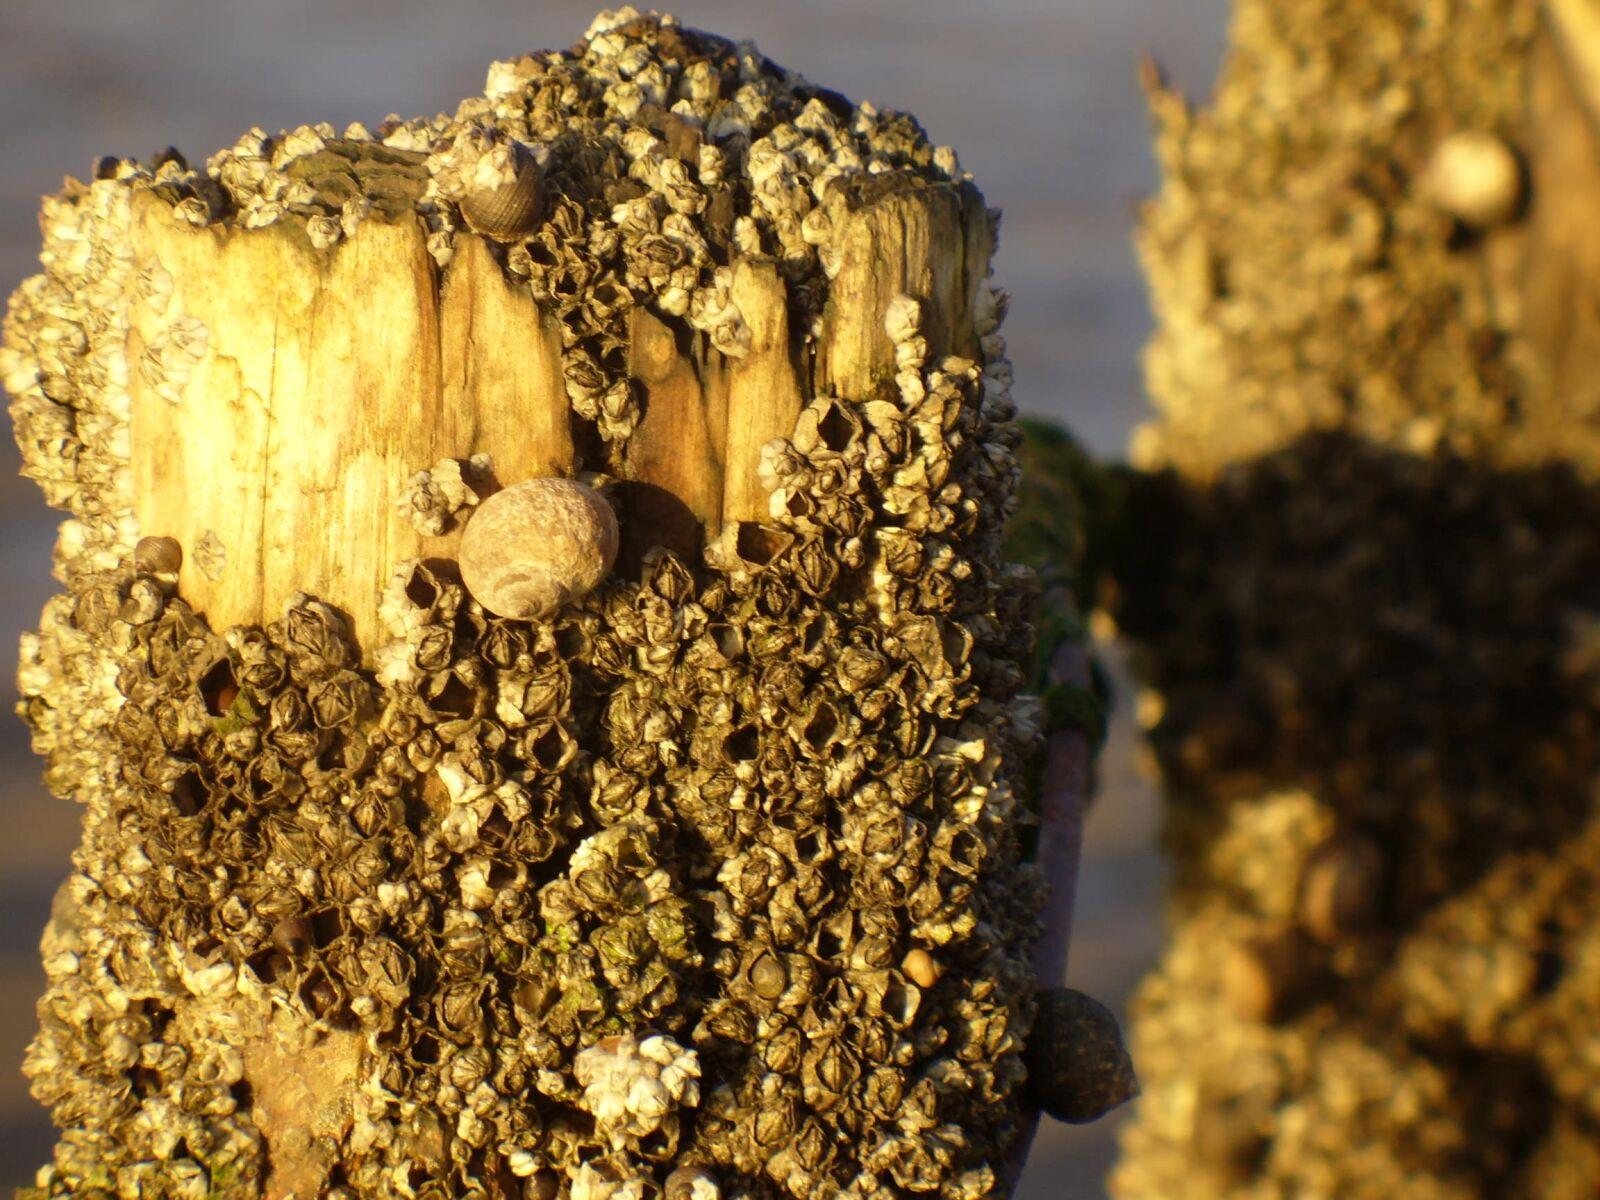 "Panasonic DMC-LZ1 sample photo. ""North sea, piles, mussels"" photography"